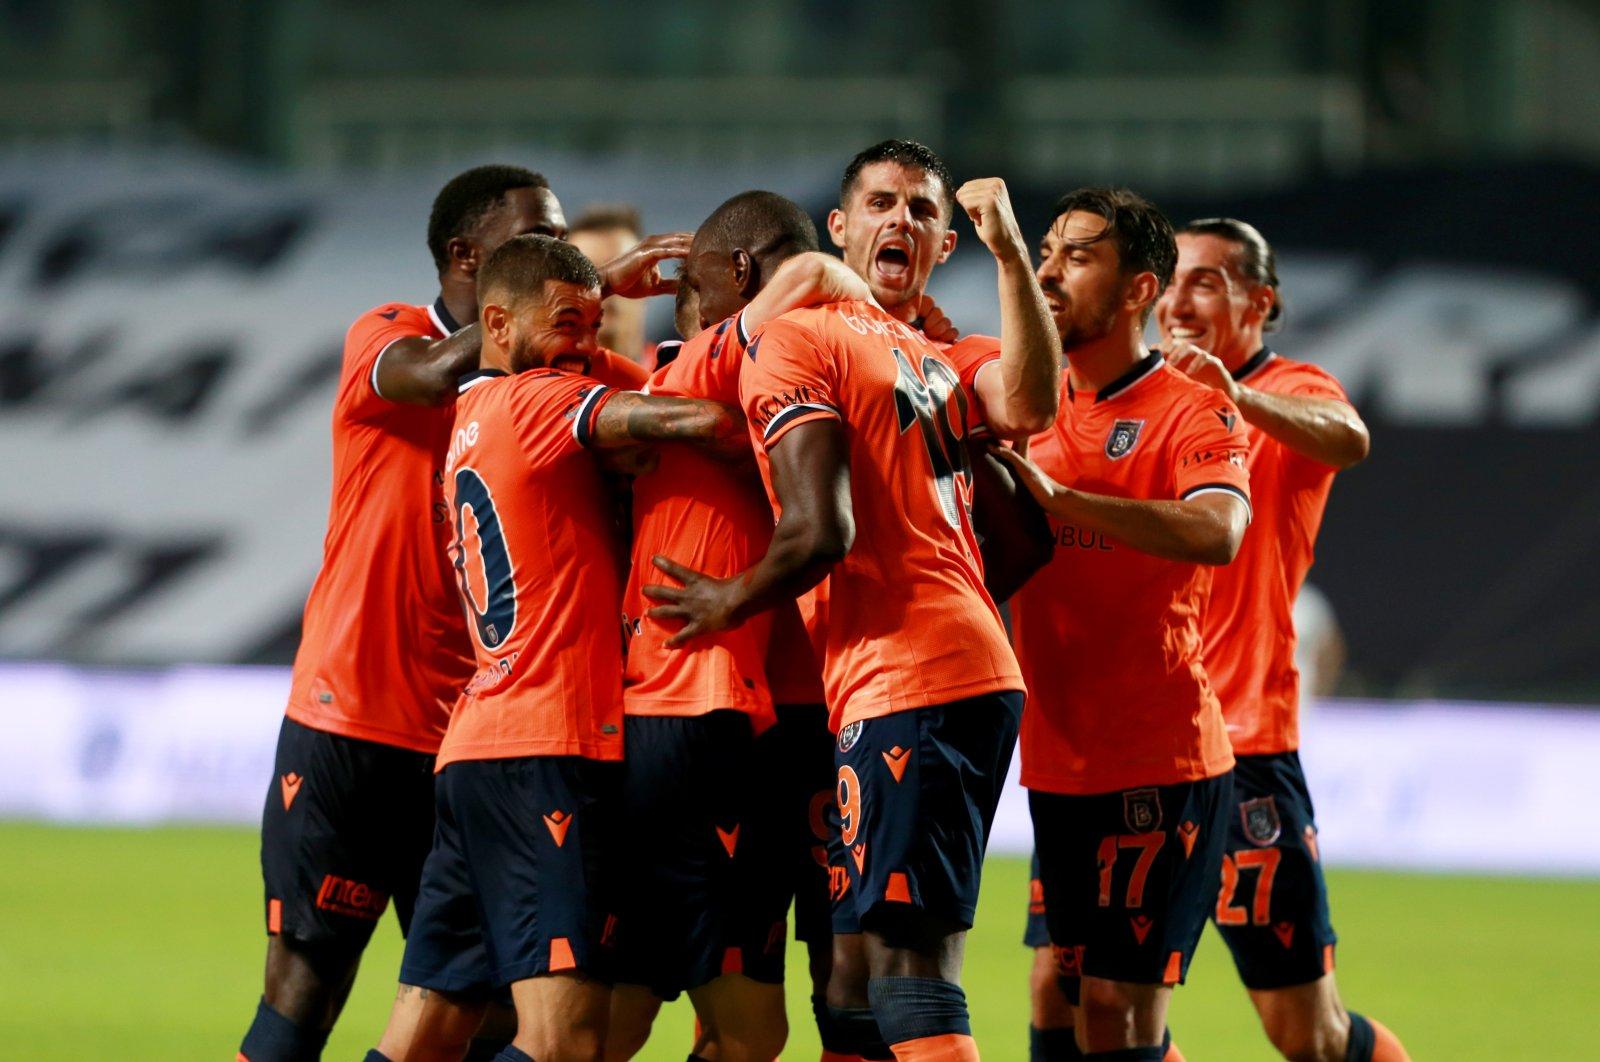 Başakşehir players celebrate defeating Denizlispor after a Süper Lig match in Istanbul, Turkey, July 7, 2020. (AA Photo)